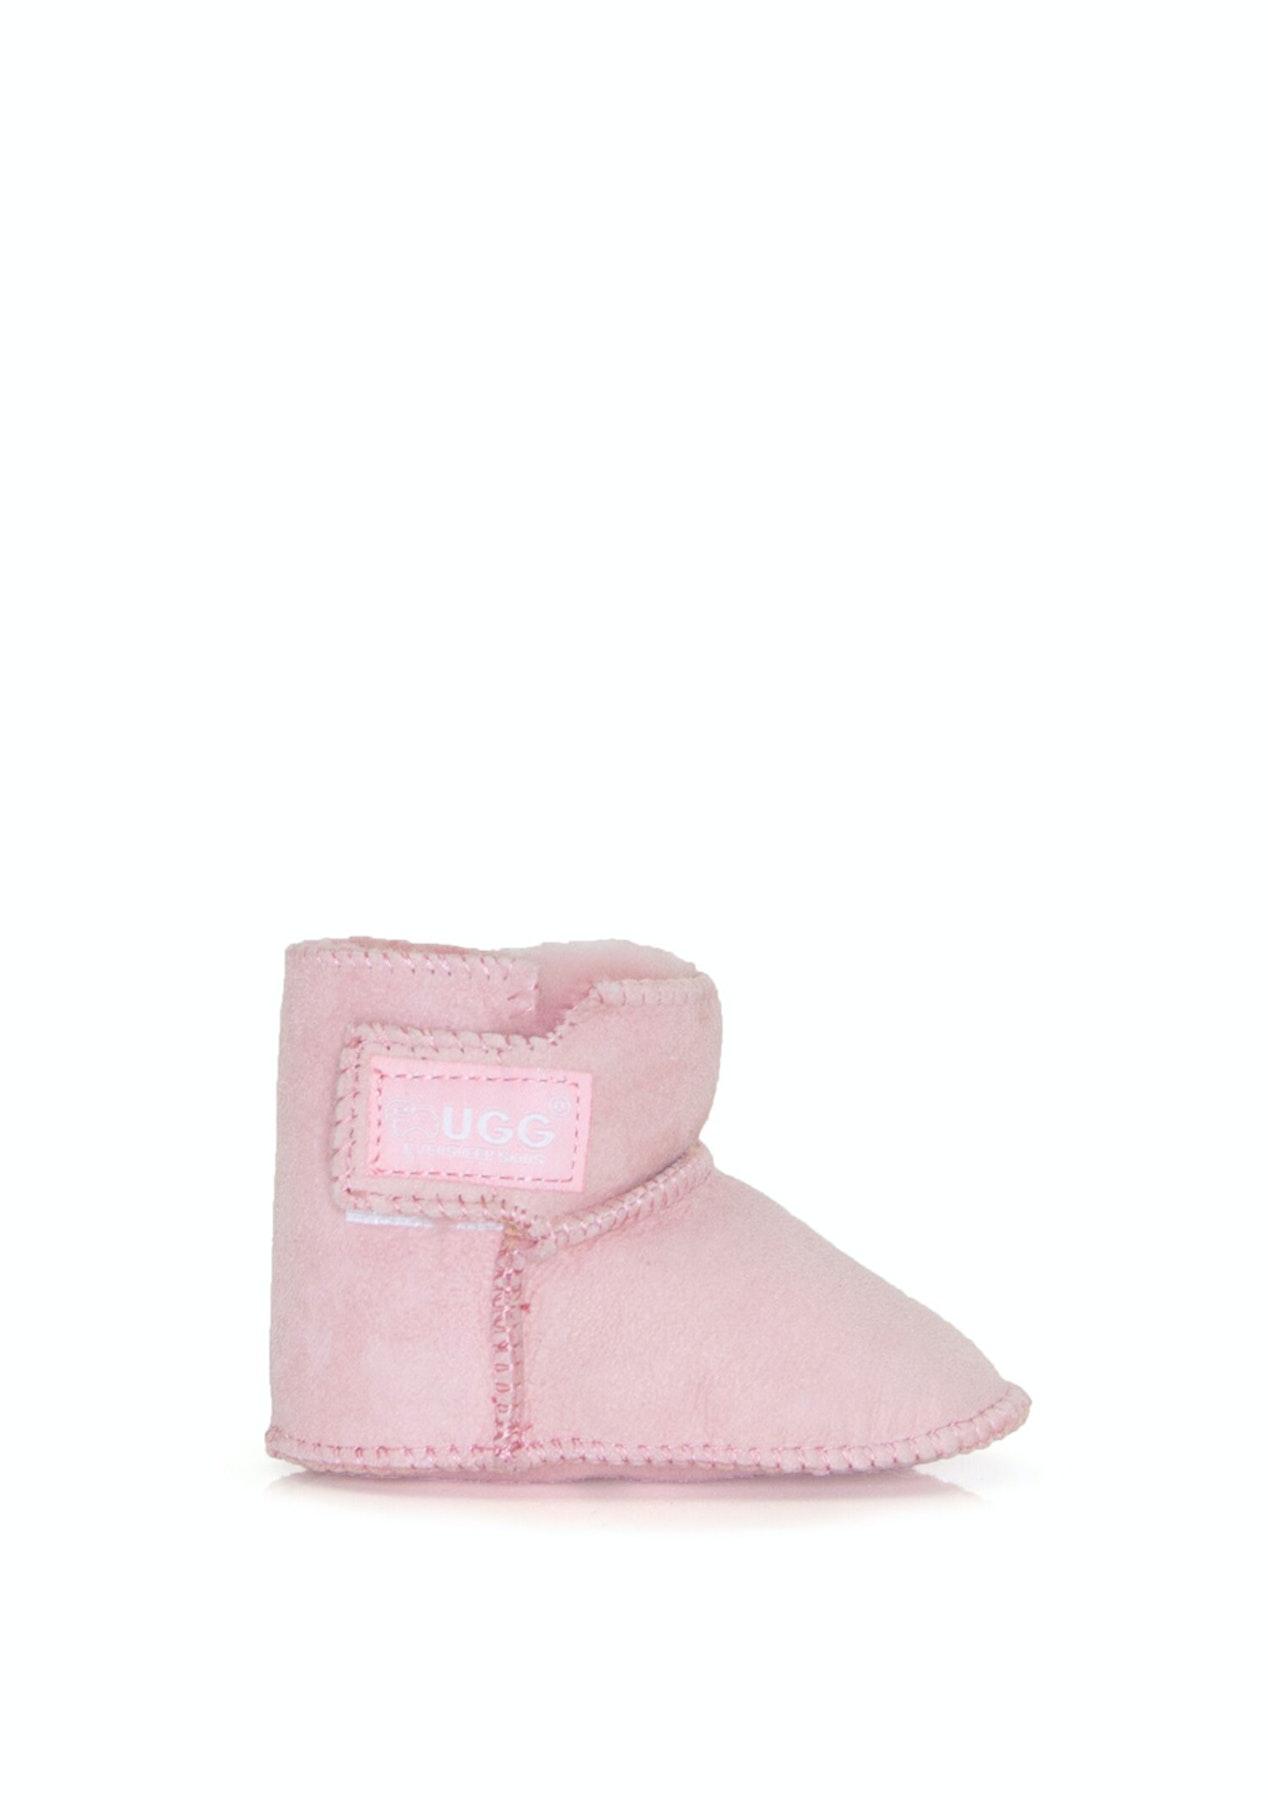 69c14a76de7 Ever Uggs - Erin baby bootie - Pink - Ever Uggs - Onceit